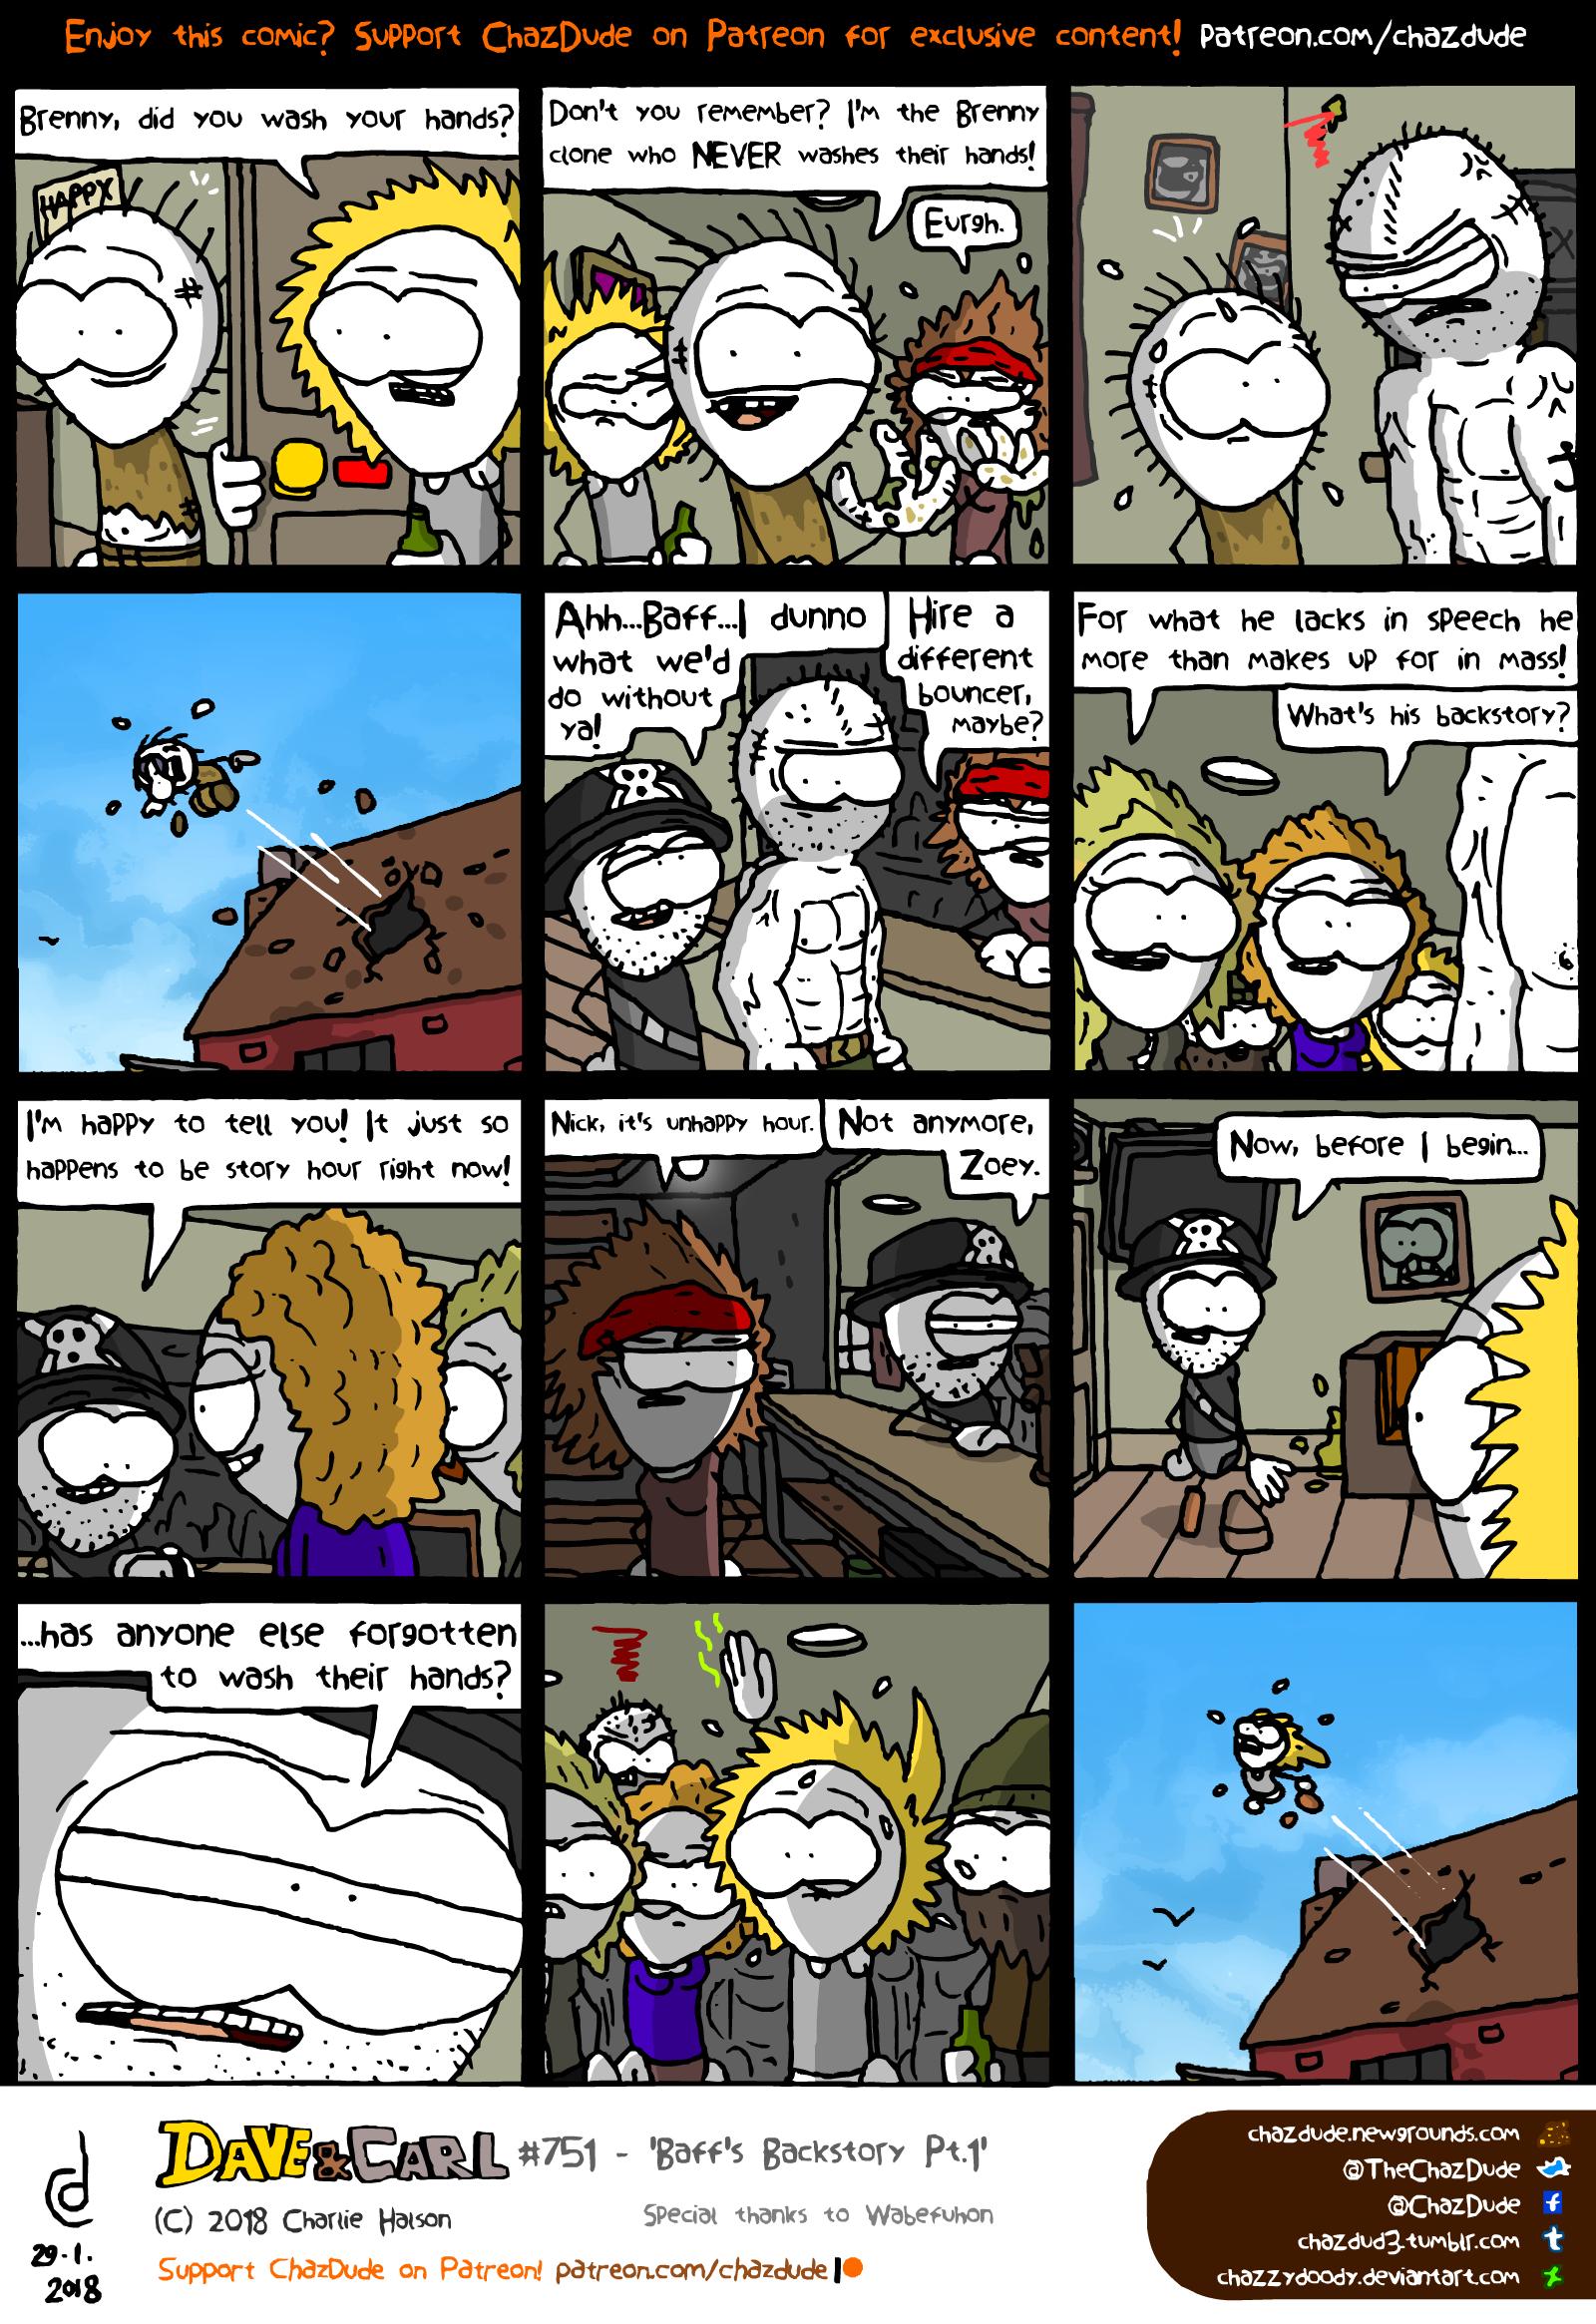 Baff's Backstory Pt.1